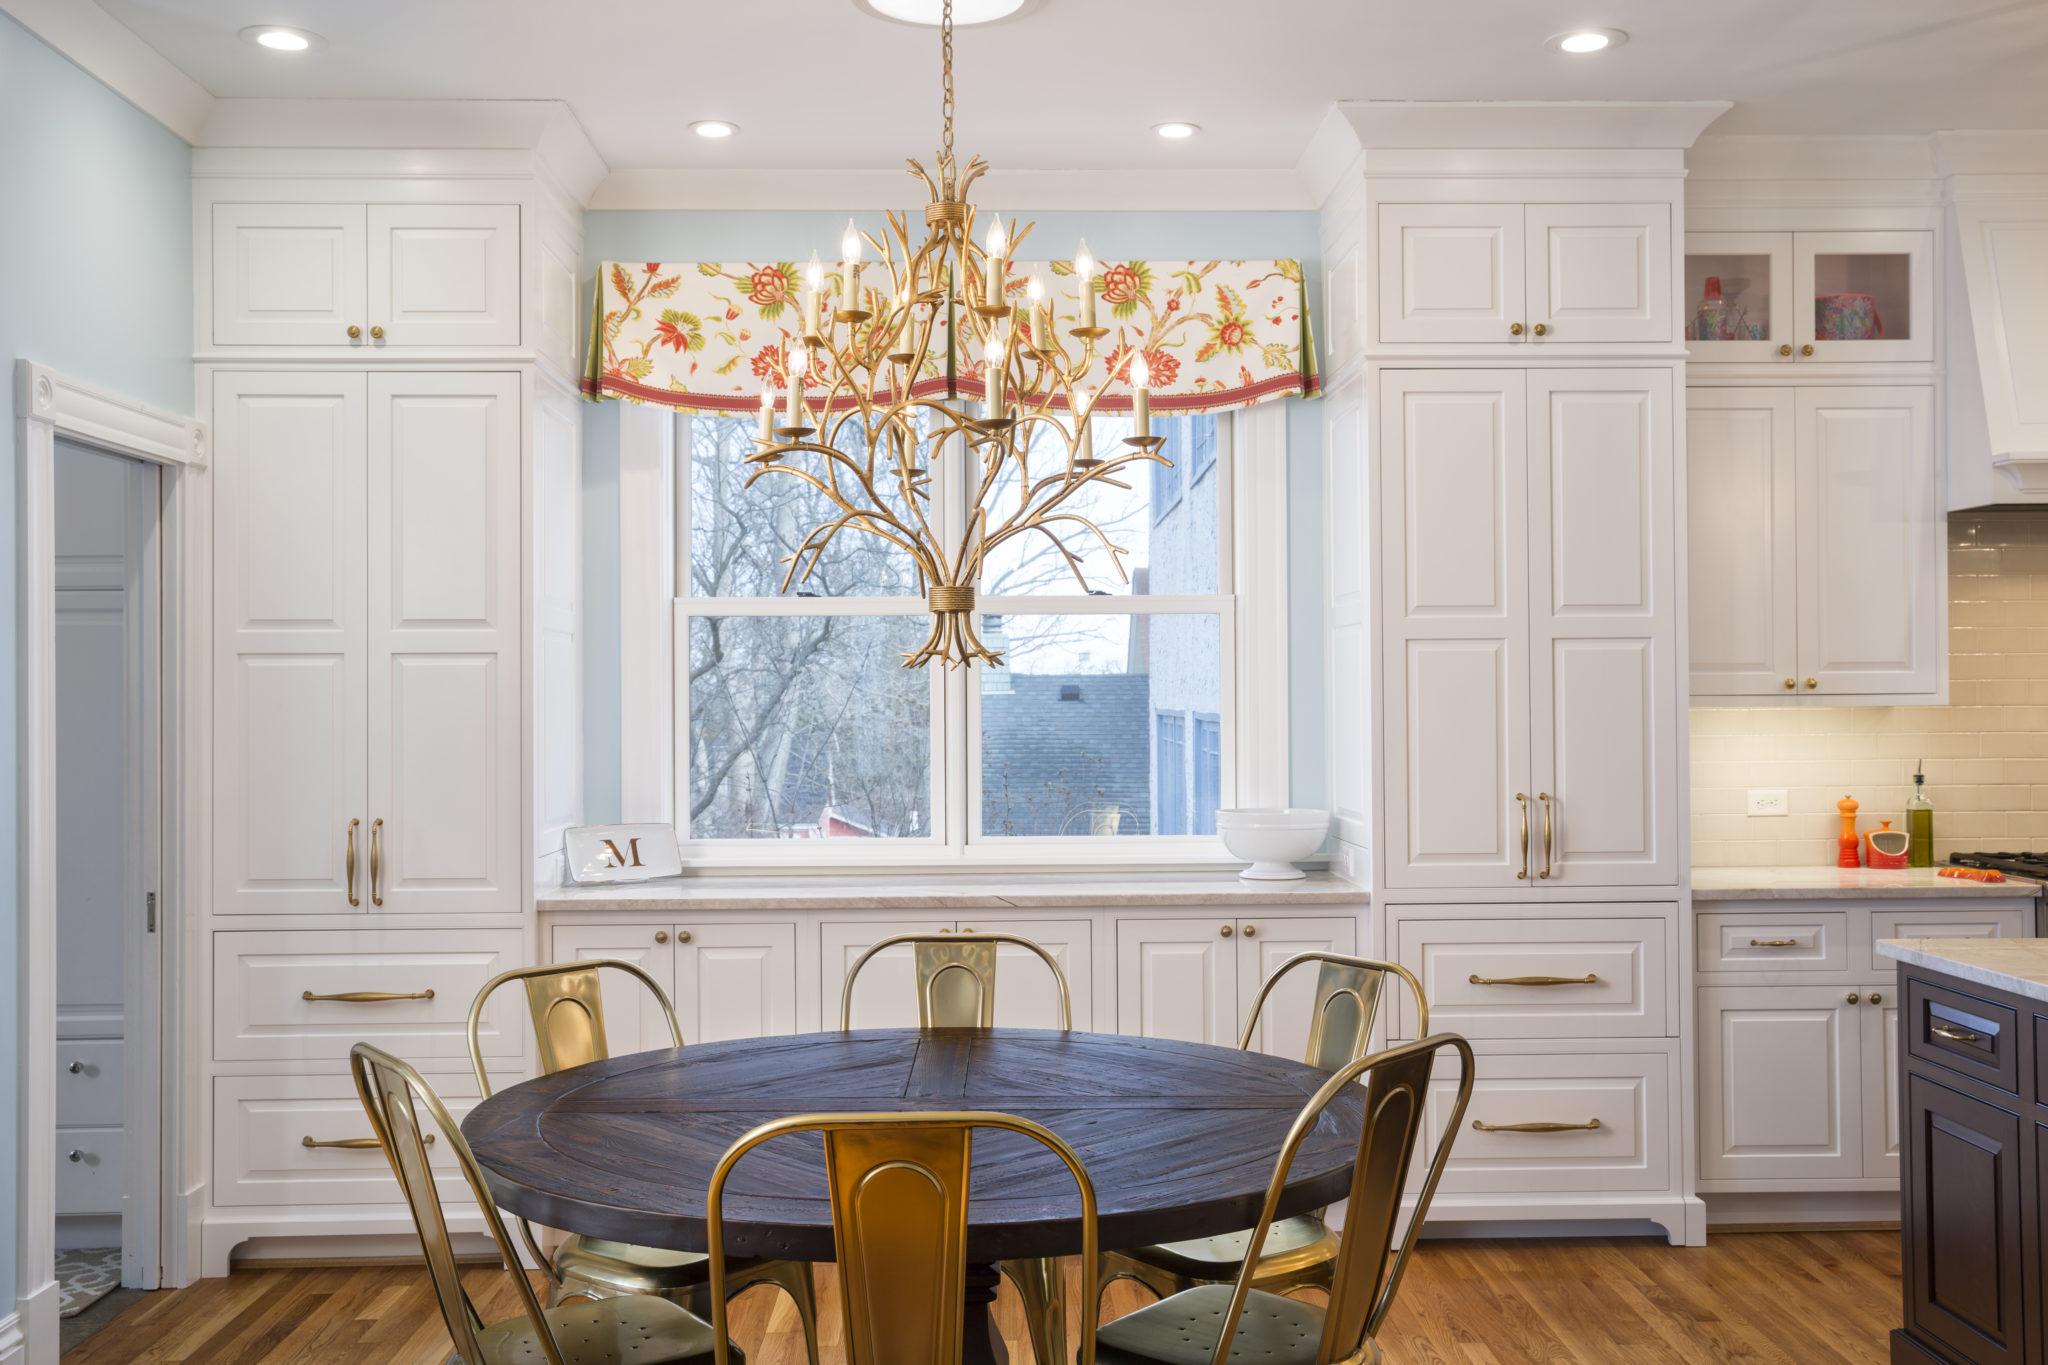 Kitchen U0026 Family Room Remodel U2013 Dining Table Details